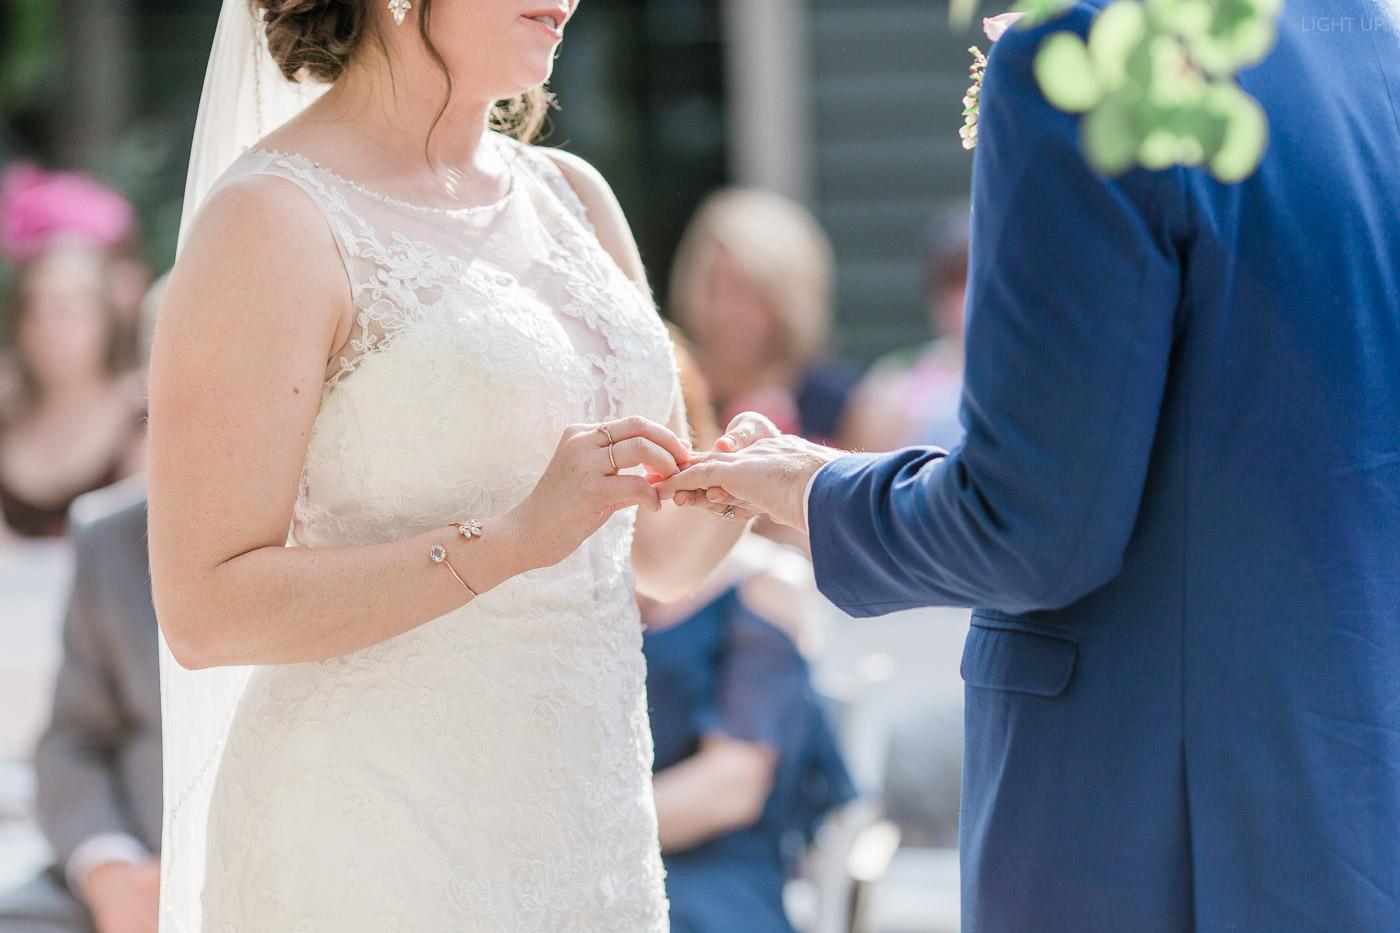 hstoric-dubsdread-wedding-orlando-13.jpg